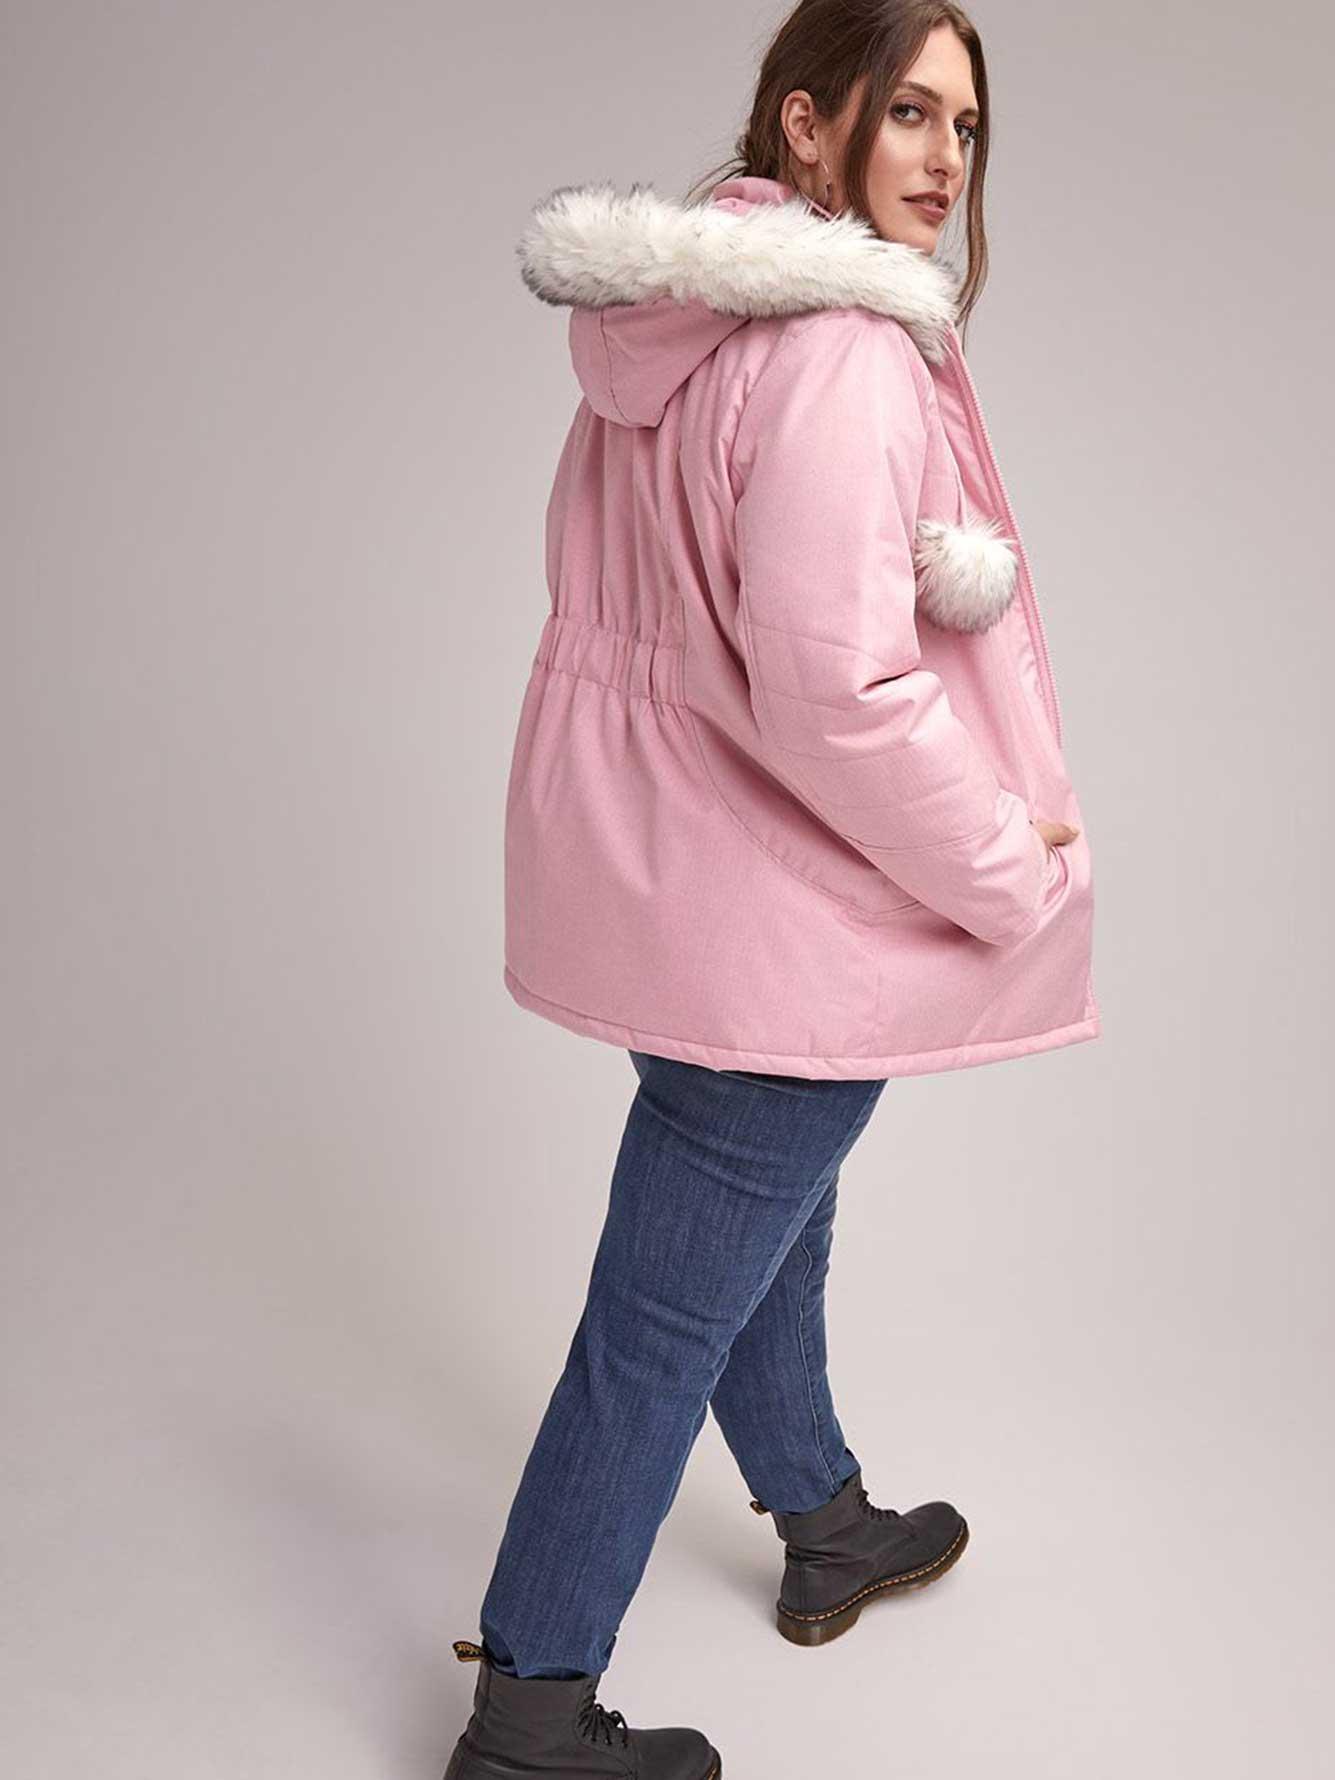 Plus Size Ski Jacket With Hood And Pom Pom Activezone Penningtons